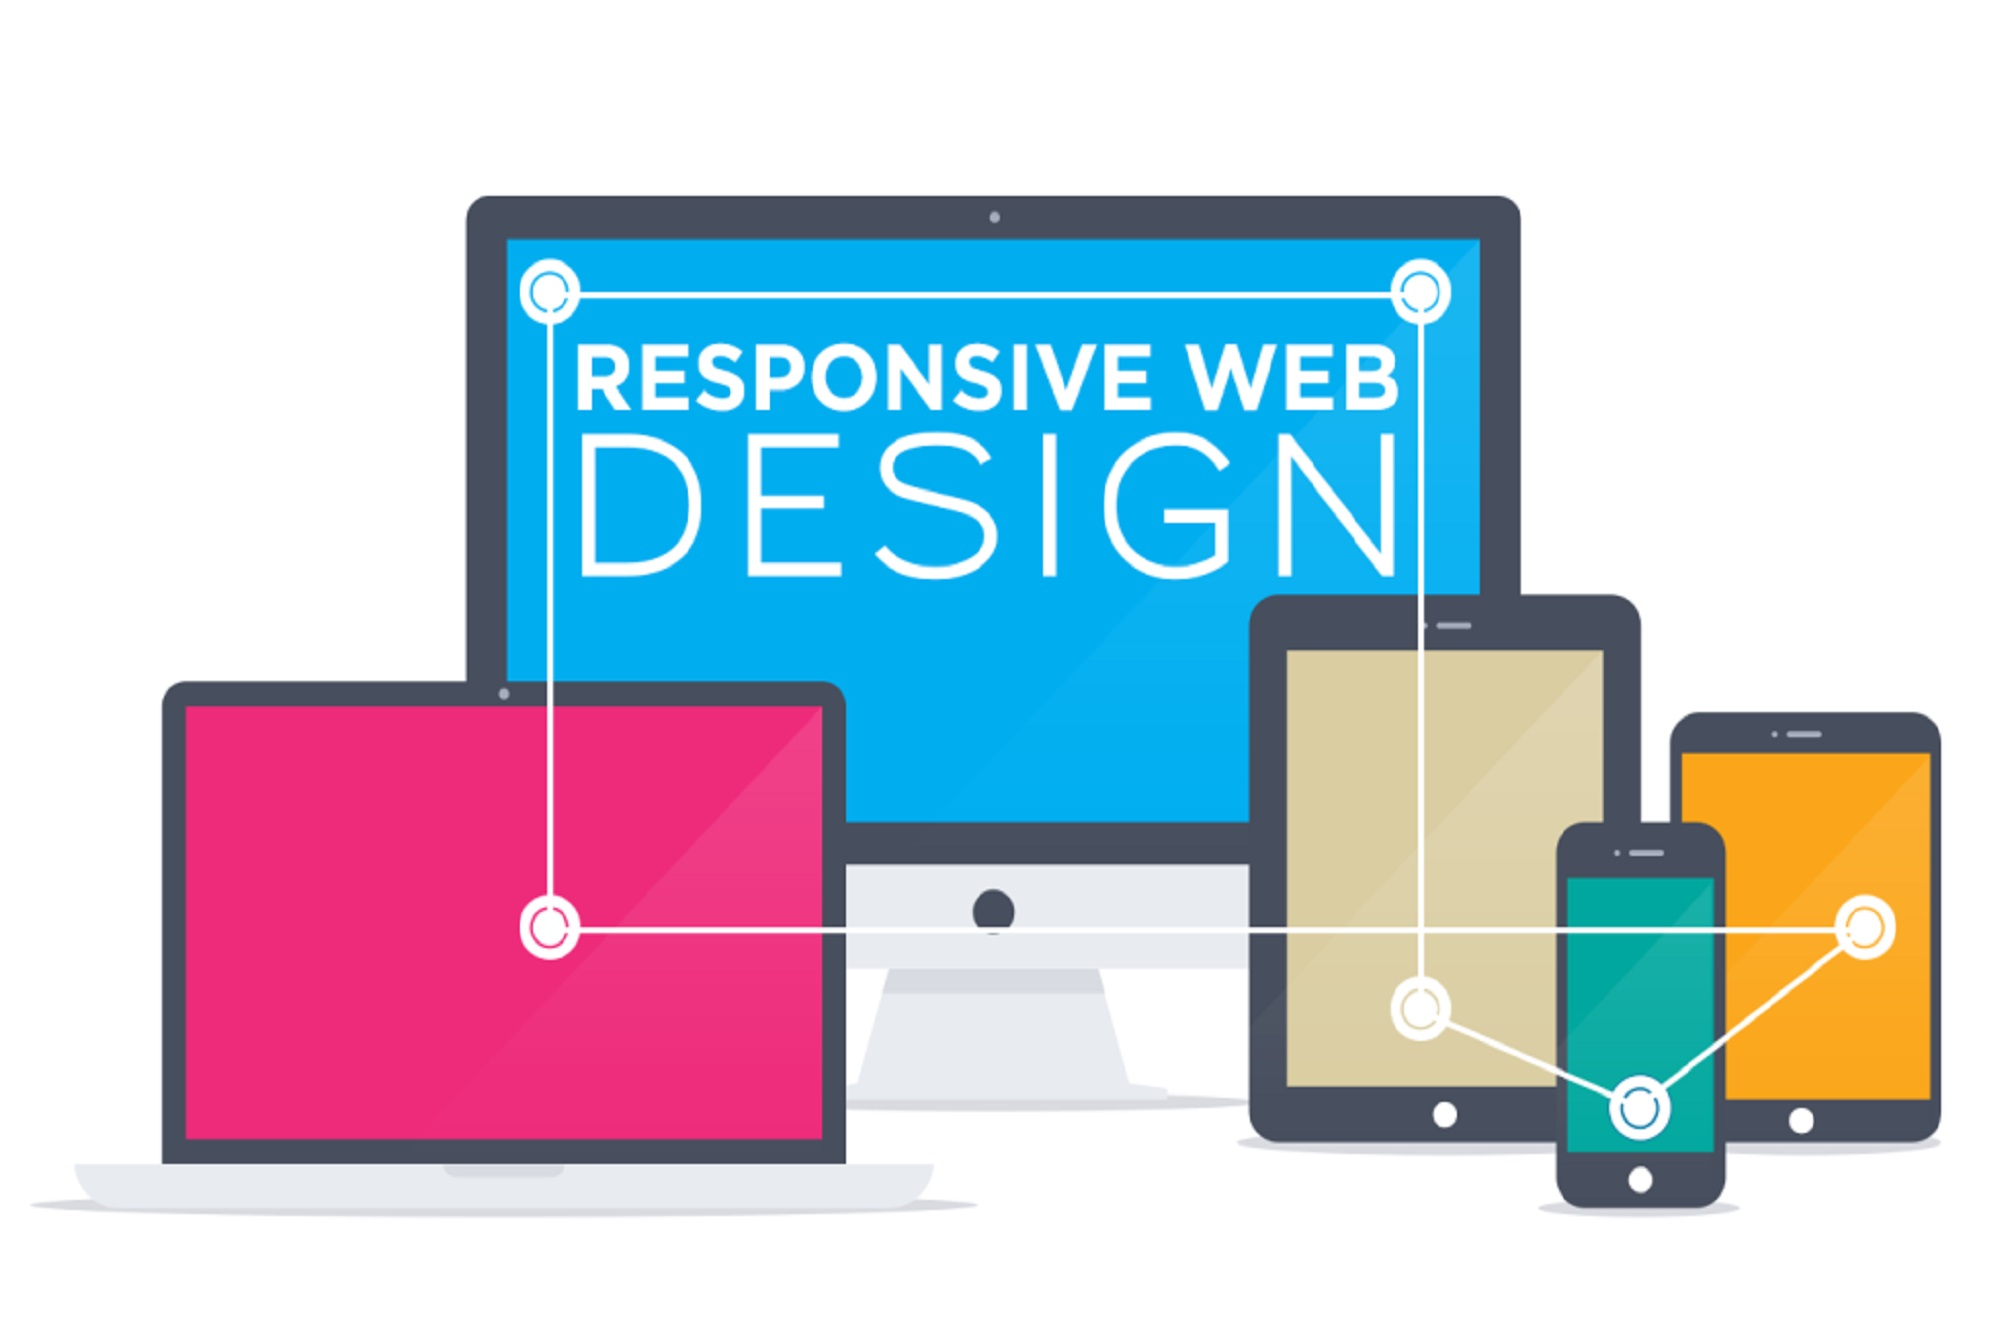 ressponsive platform design